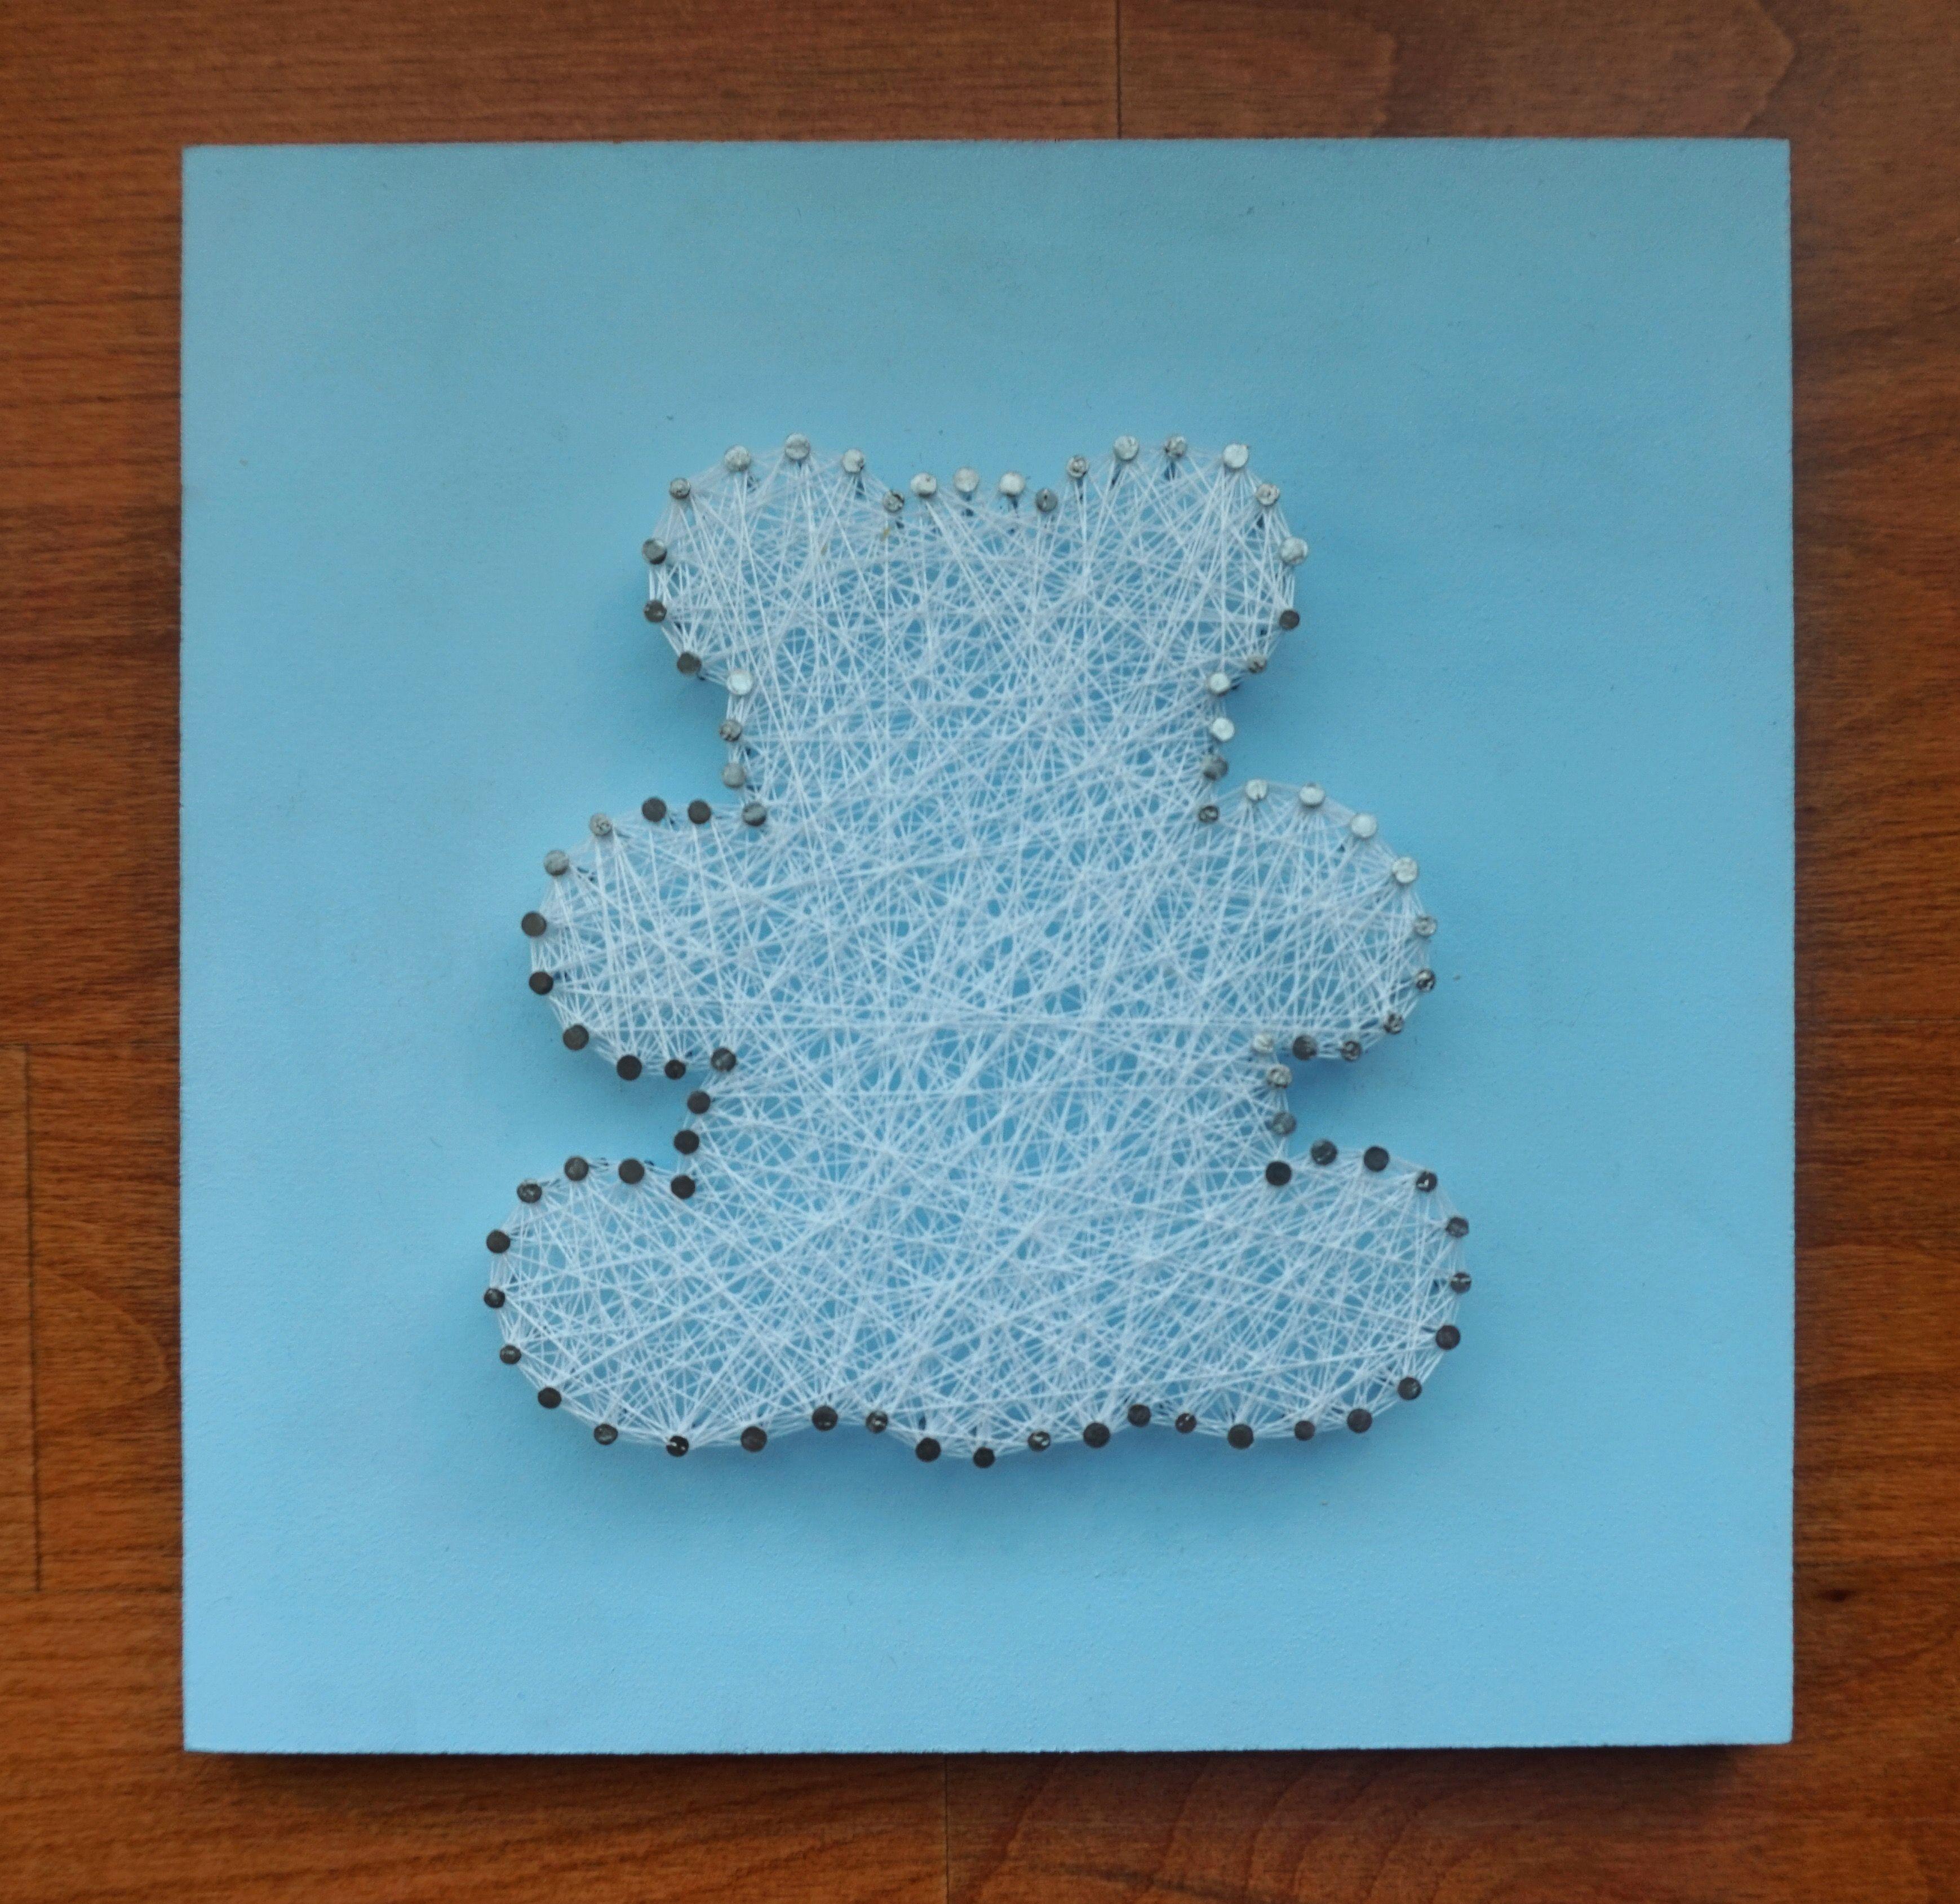 Oso infantil. Madera lacada en color azul celeste. Hilo blanco. Medidas: 20x20 cm. €7.99